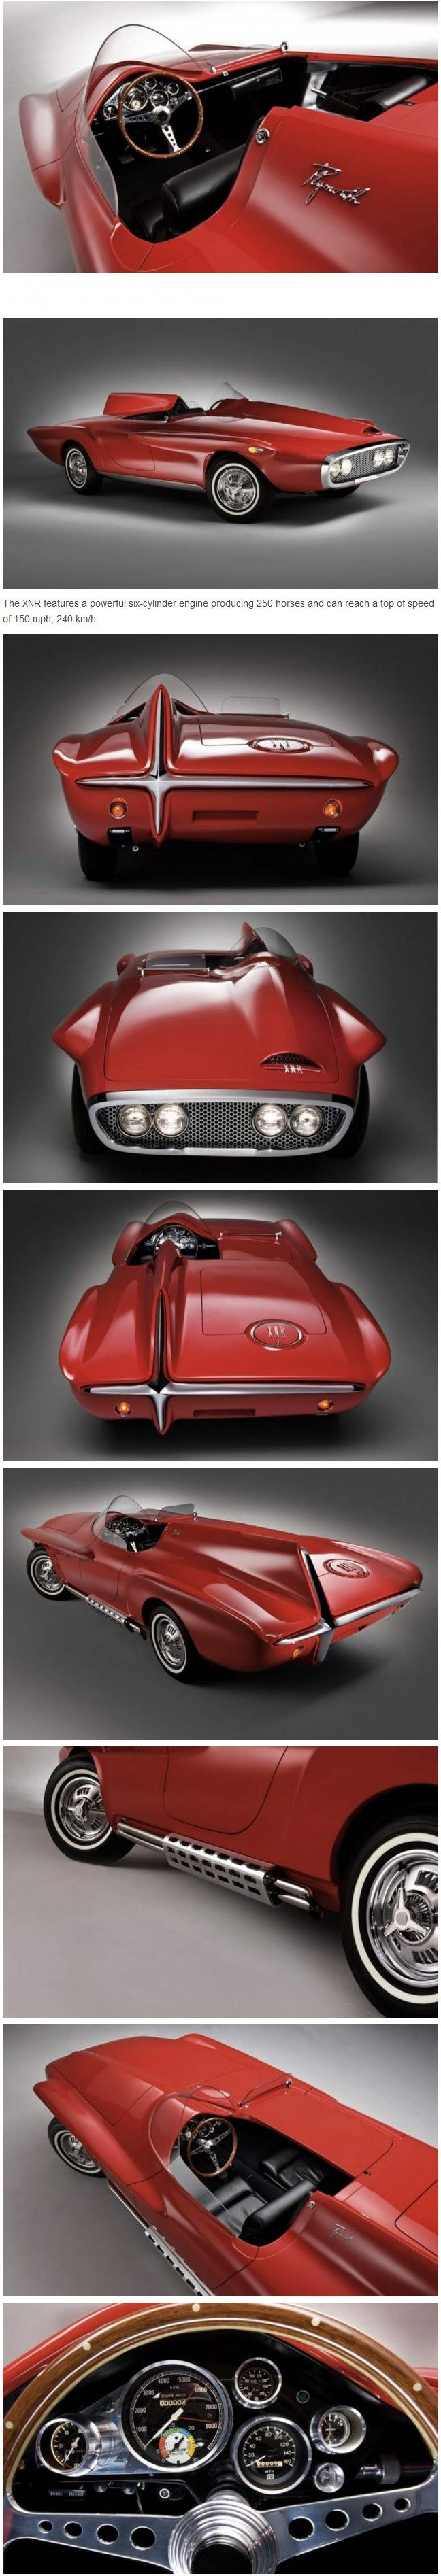 14 best infiniti essence concept images on pinterest dream cars plymouth xnr concept car vanachro Images